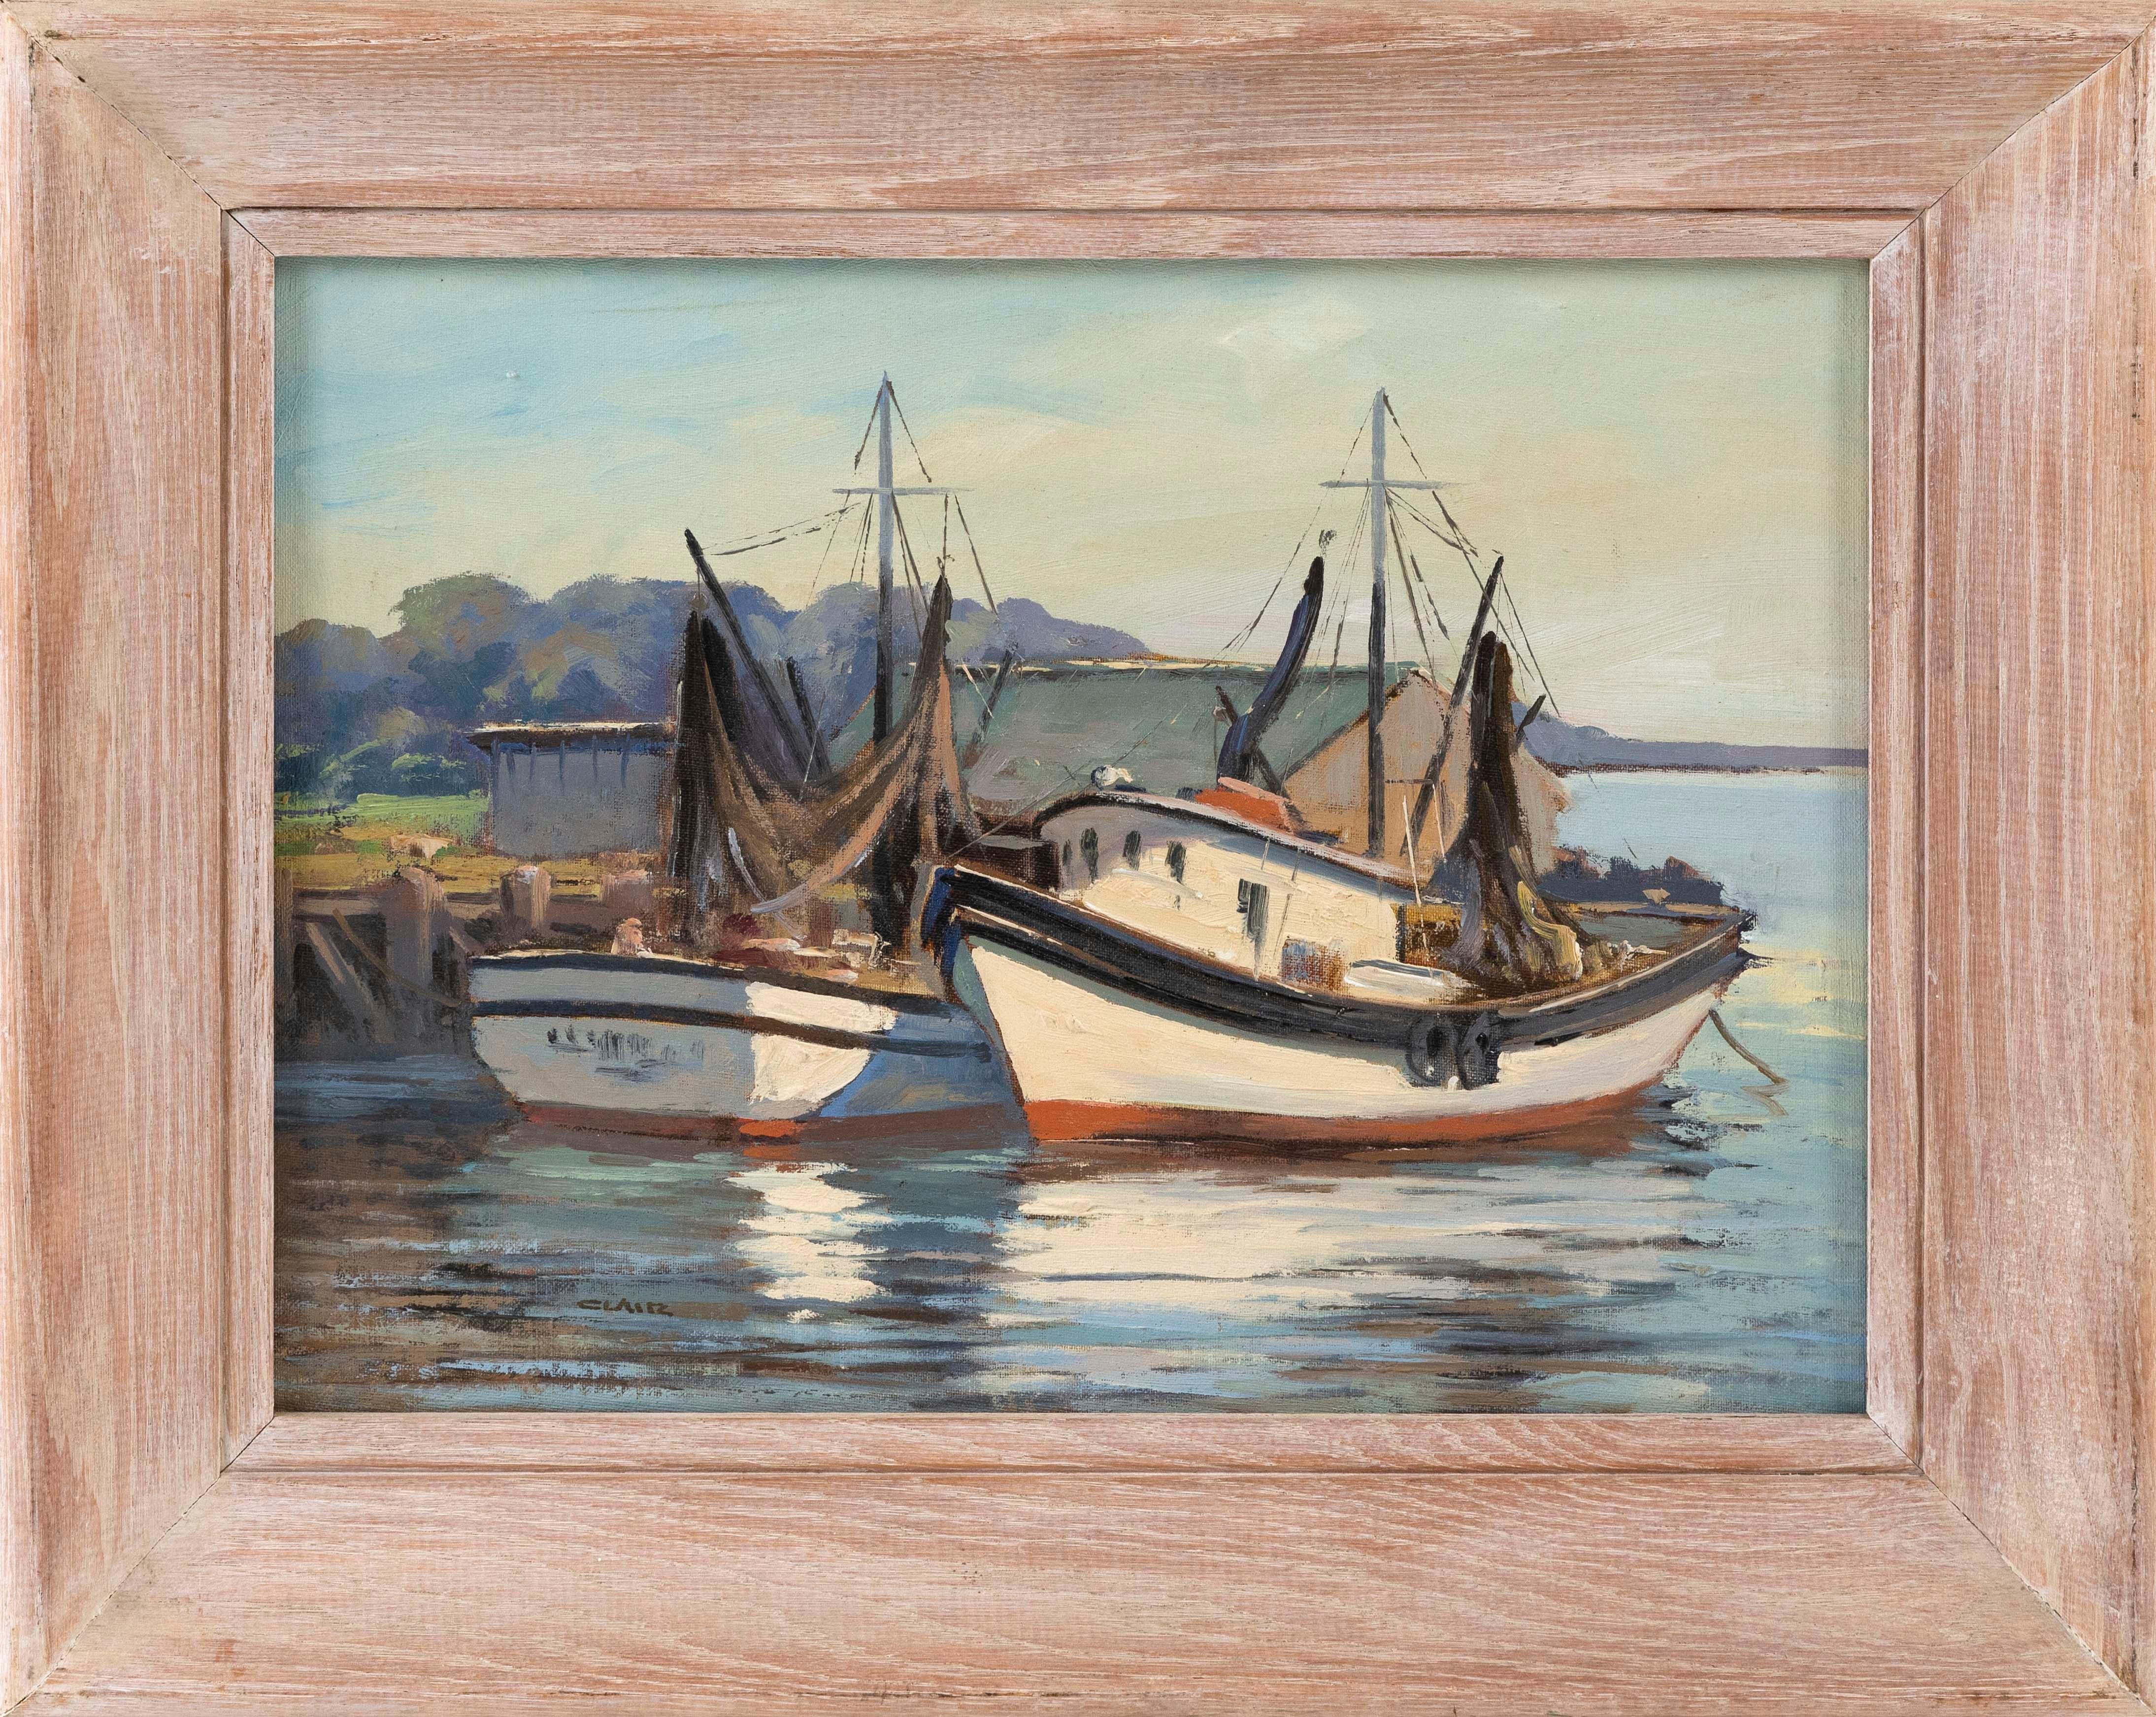 "IRENE STRY, Massachusetts/New York/Hungary, 1904-1963, Fishing boats at dock., Oil on canvas board, 12"" x 16"". Framed 17"" x 21""."